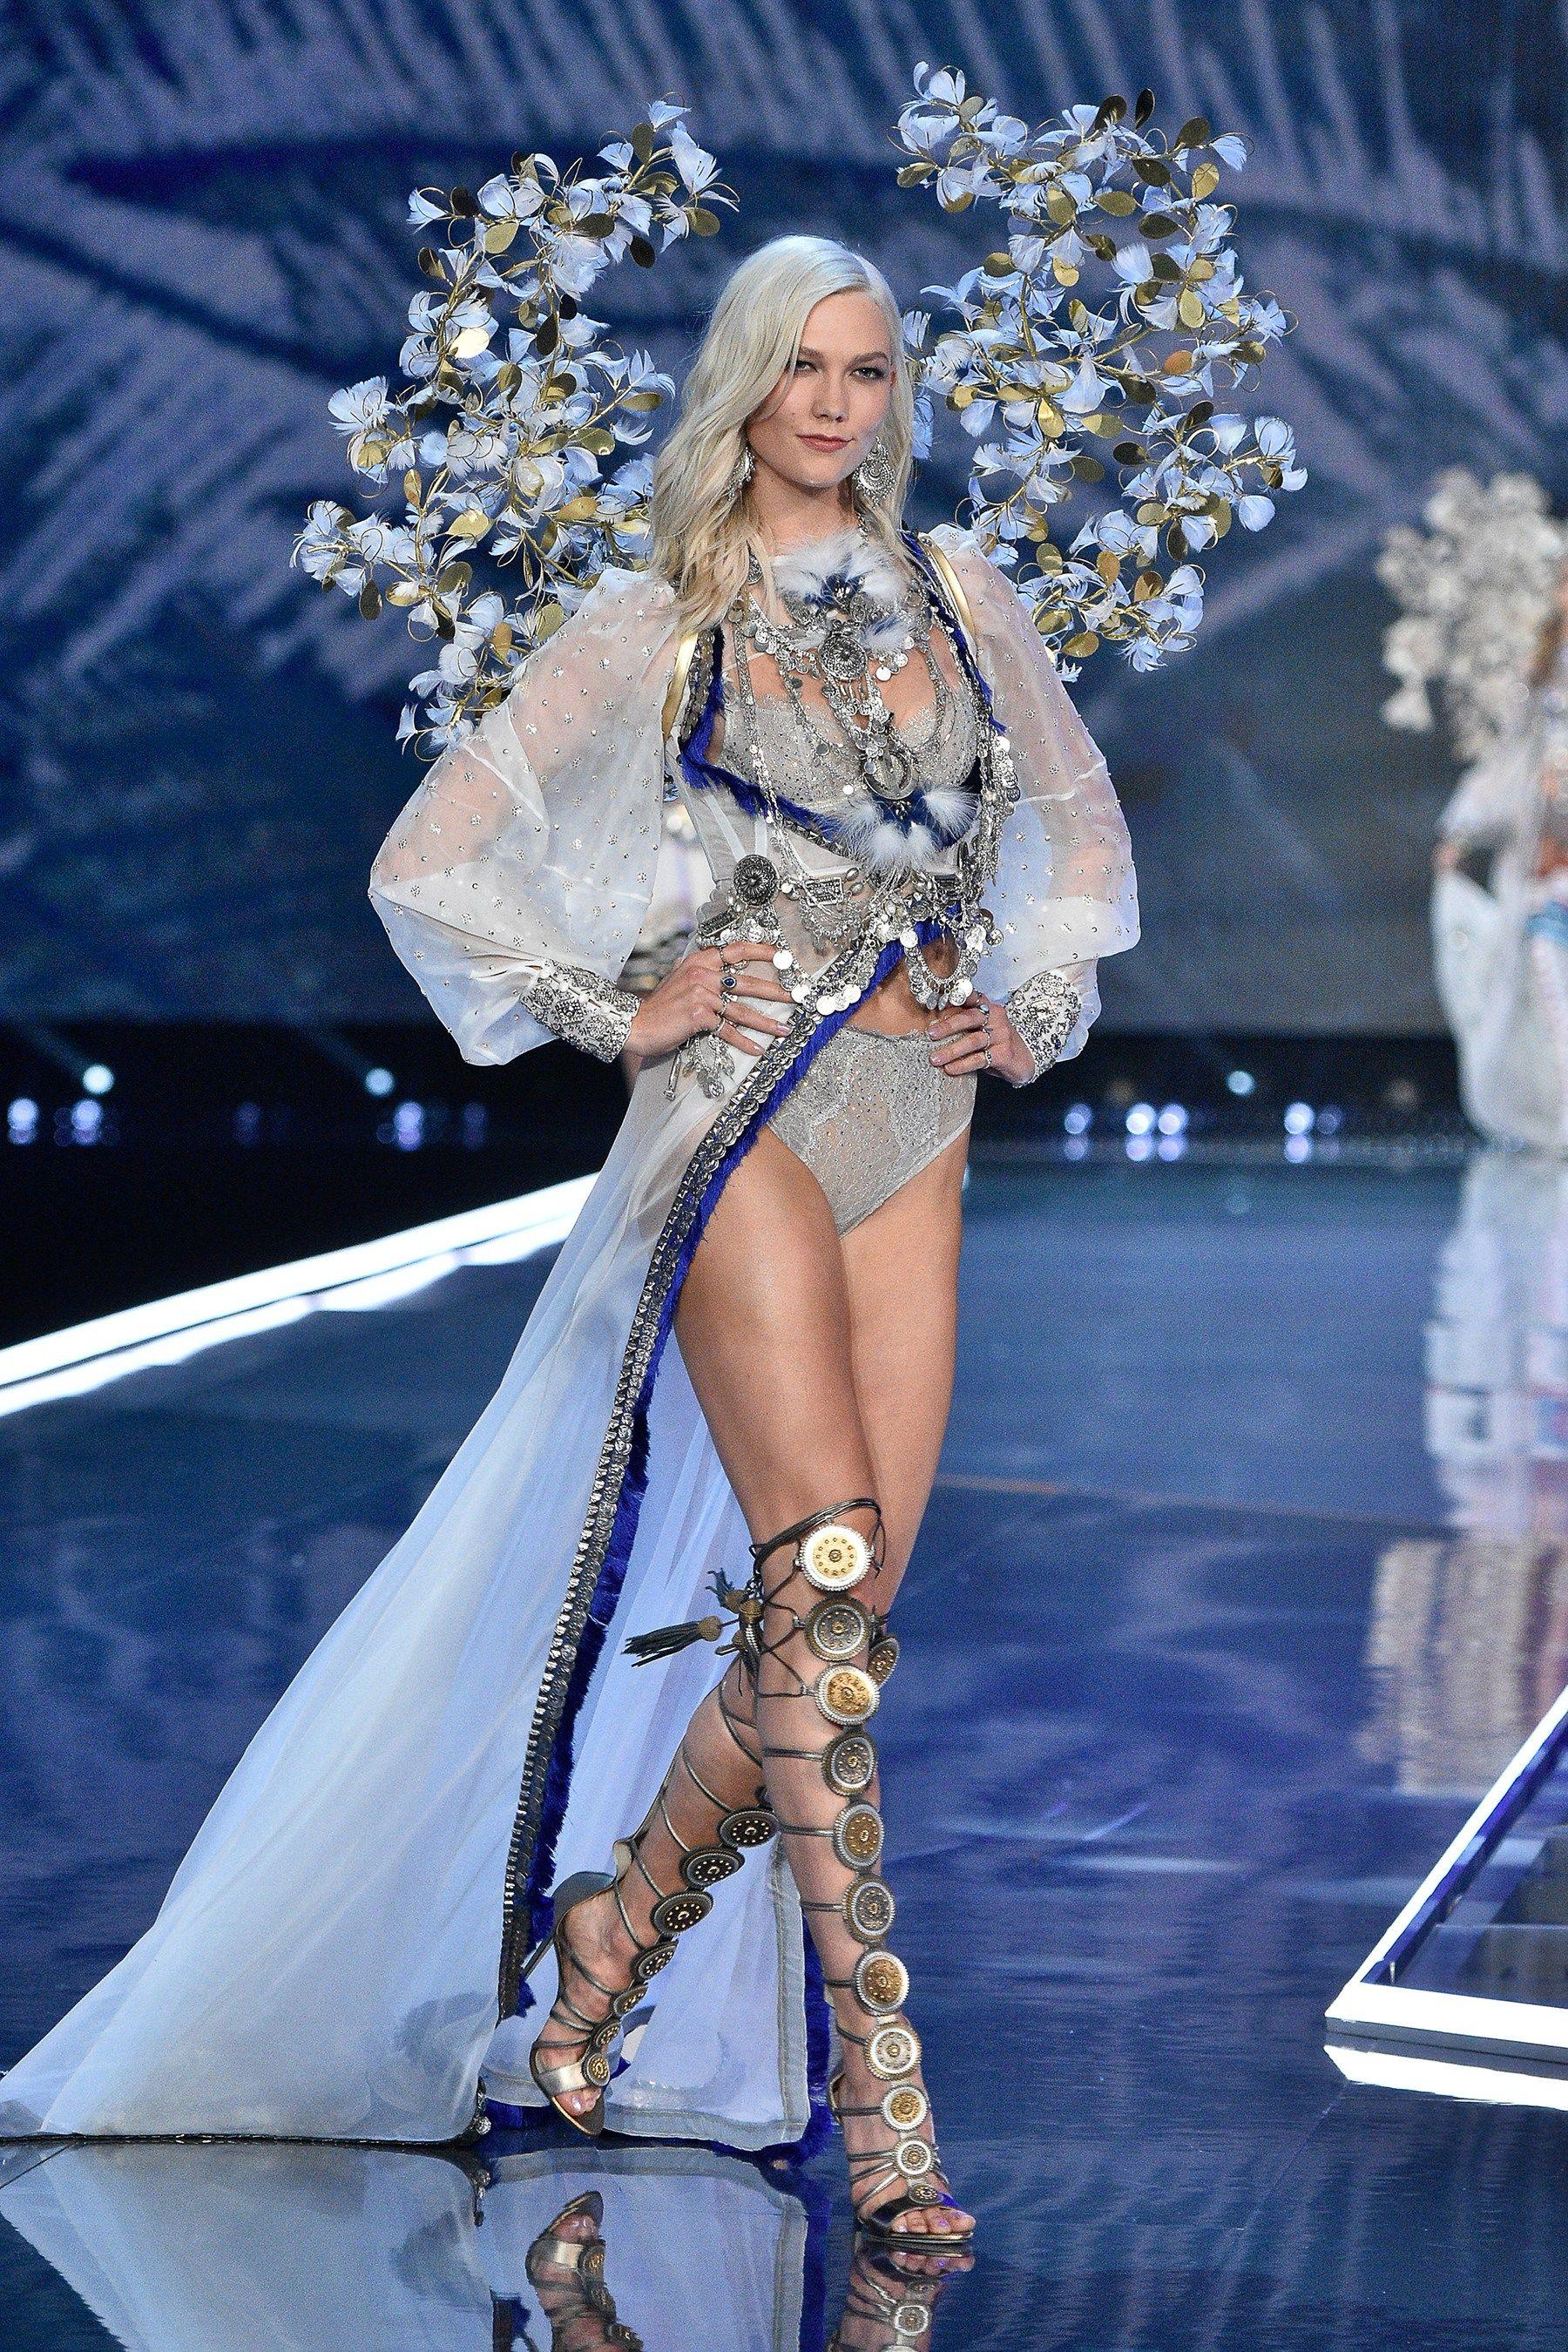 adfdde1d94a Victoria s Secret Fashion Show 2017 - The Impression